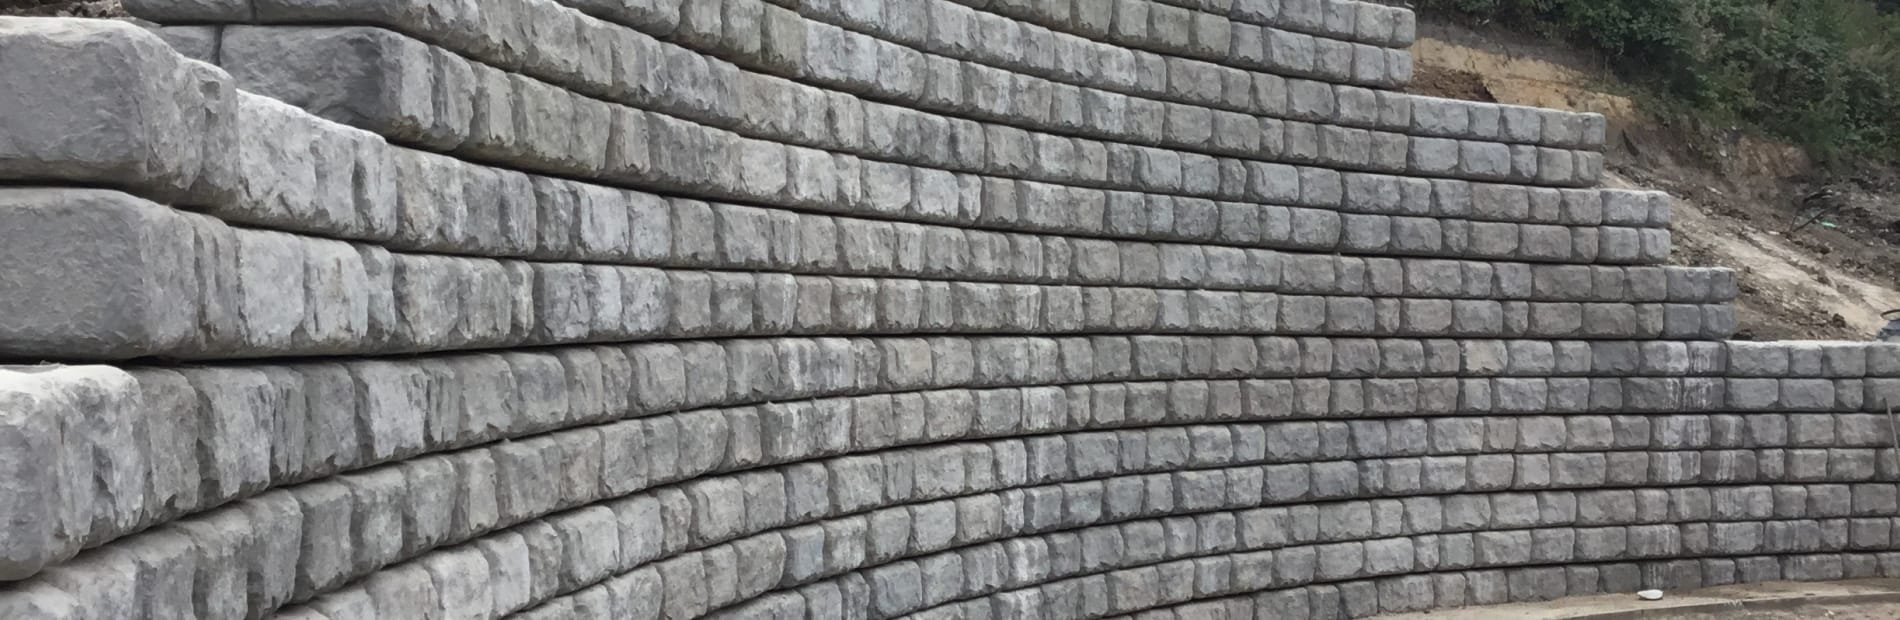 redi rock retaining wall